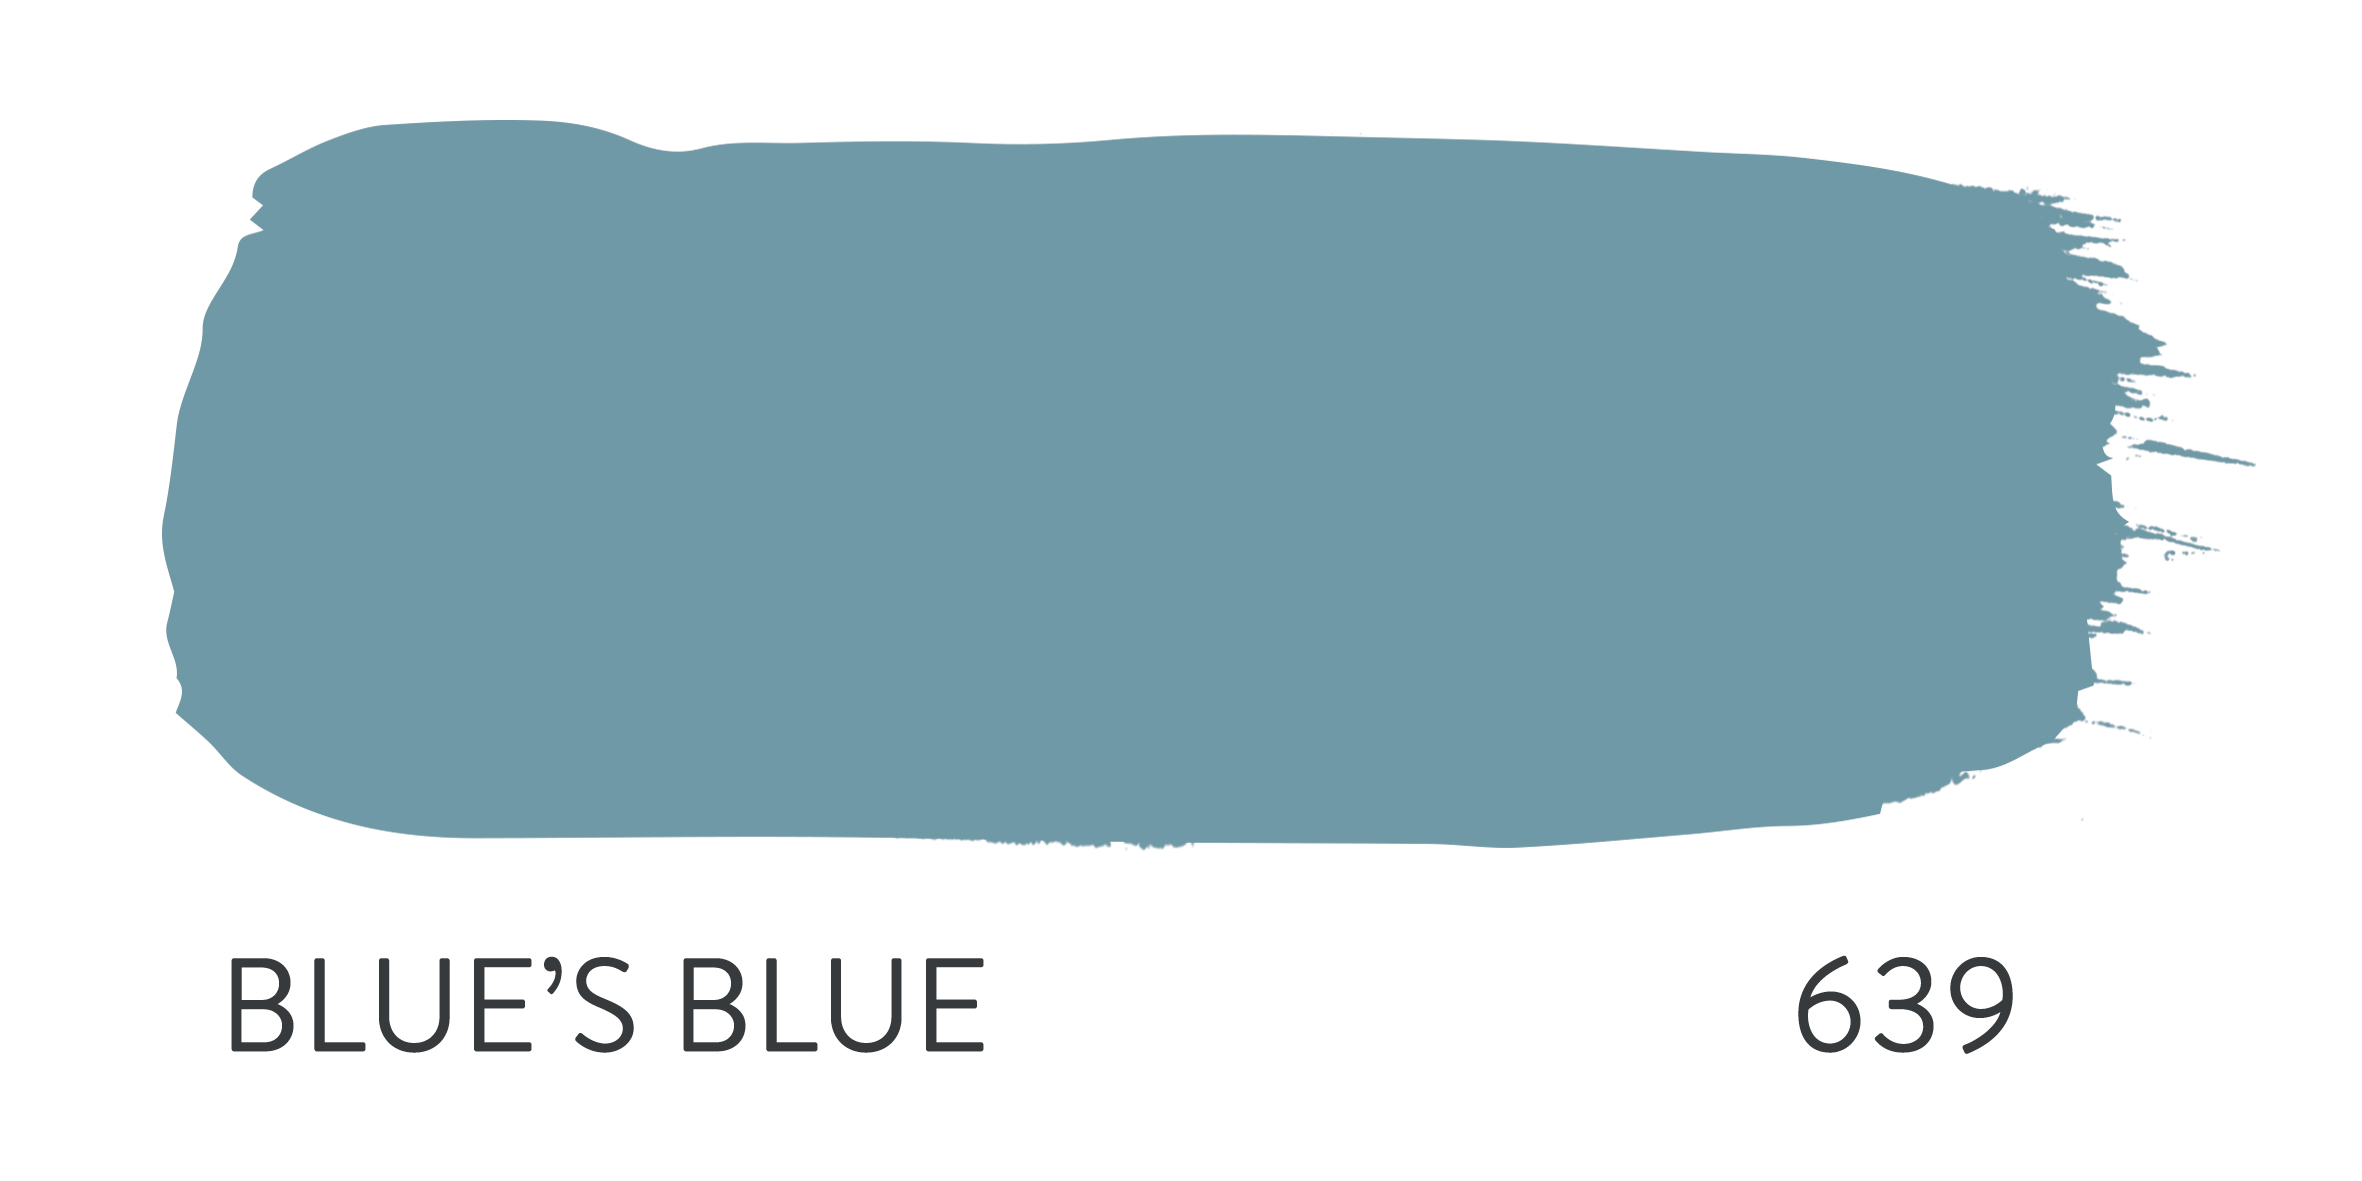 BLUE'S BLUE 639.jpg